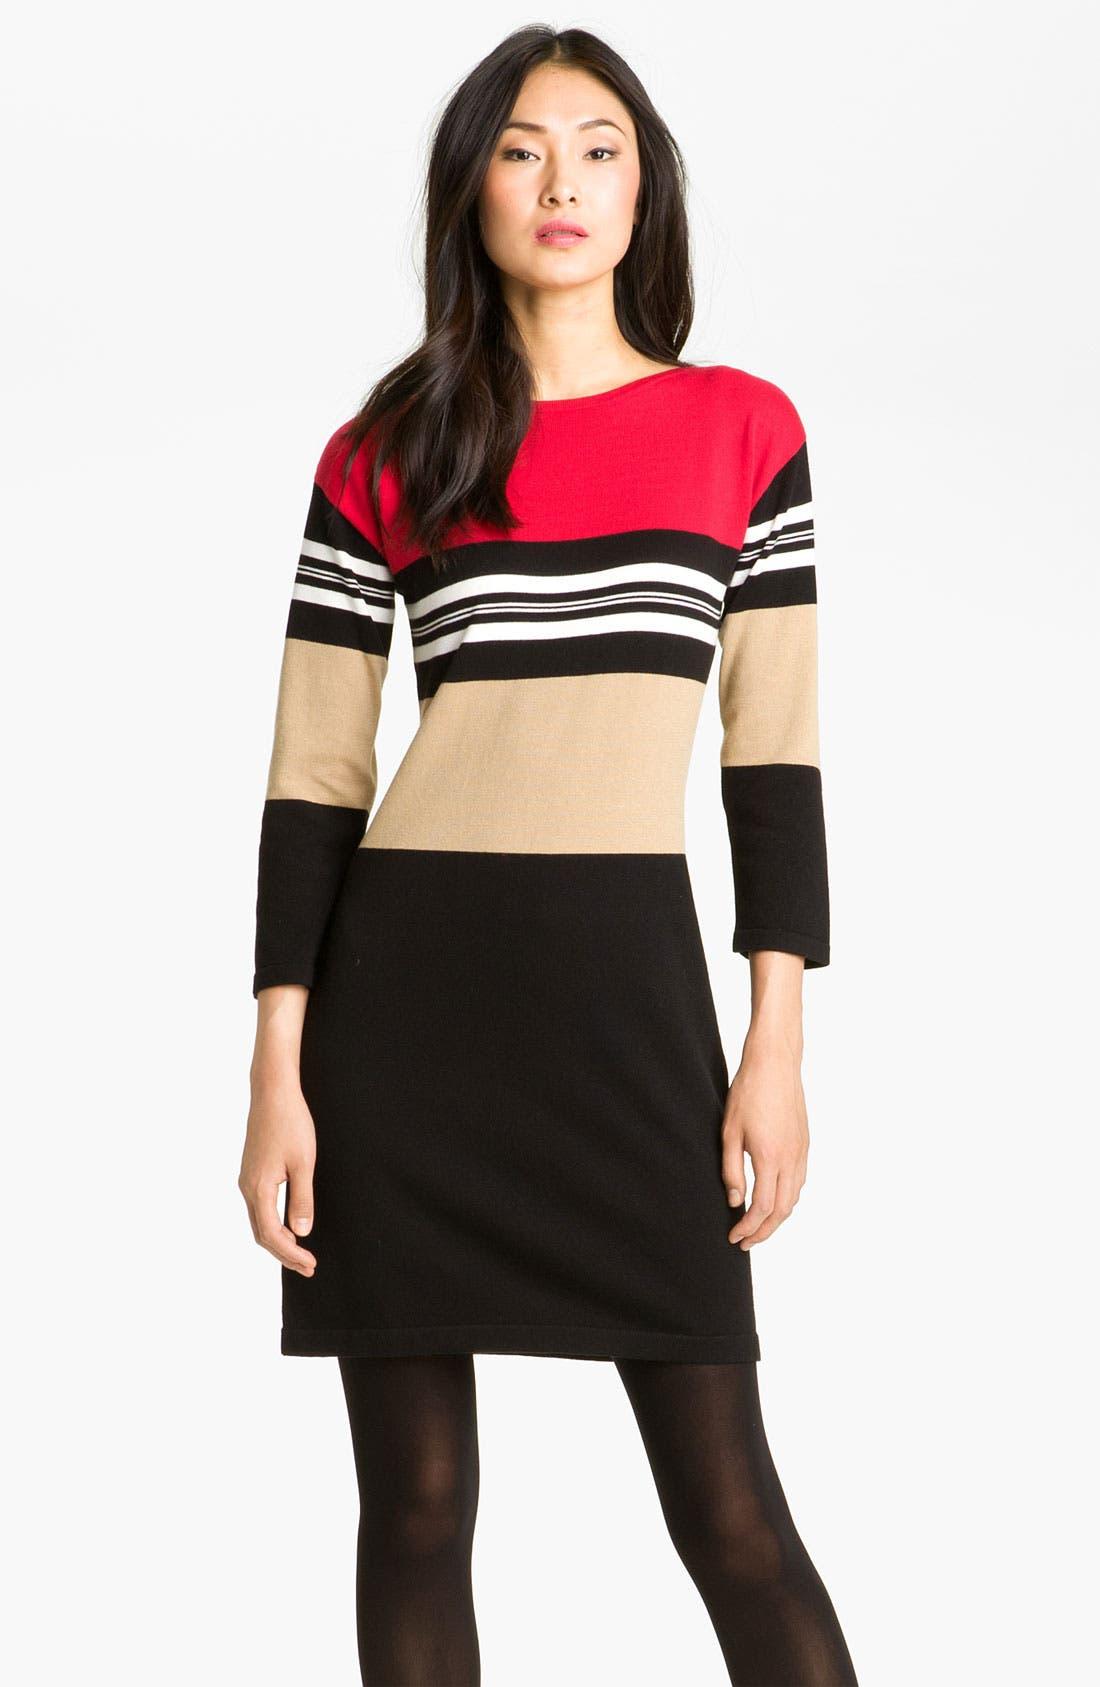 Alternate Image 1 Selected - Calvin Klein Colorblock Knit Sweater Dress